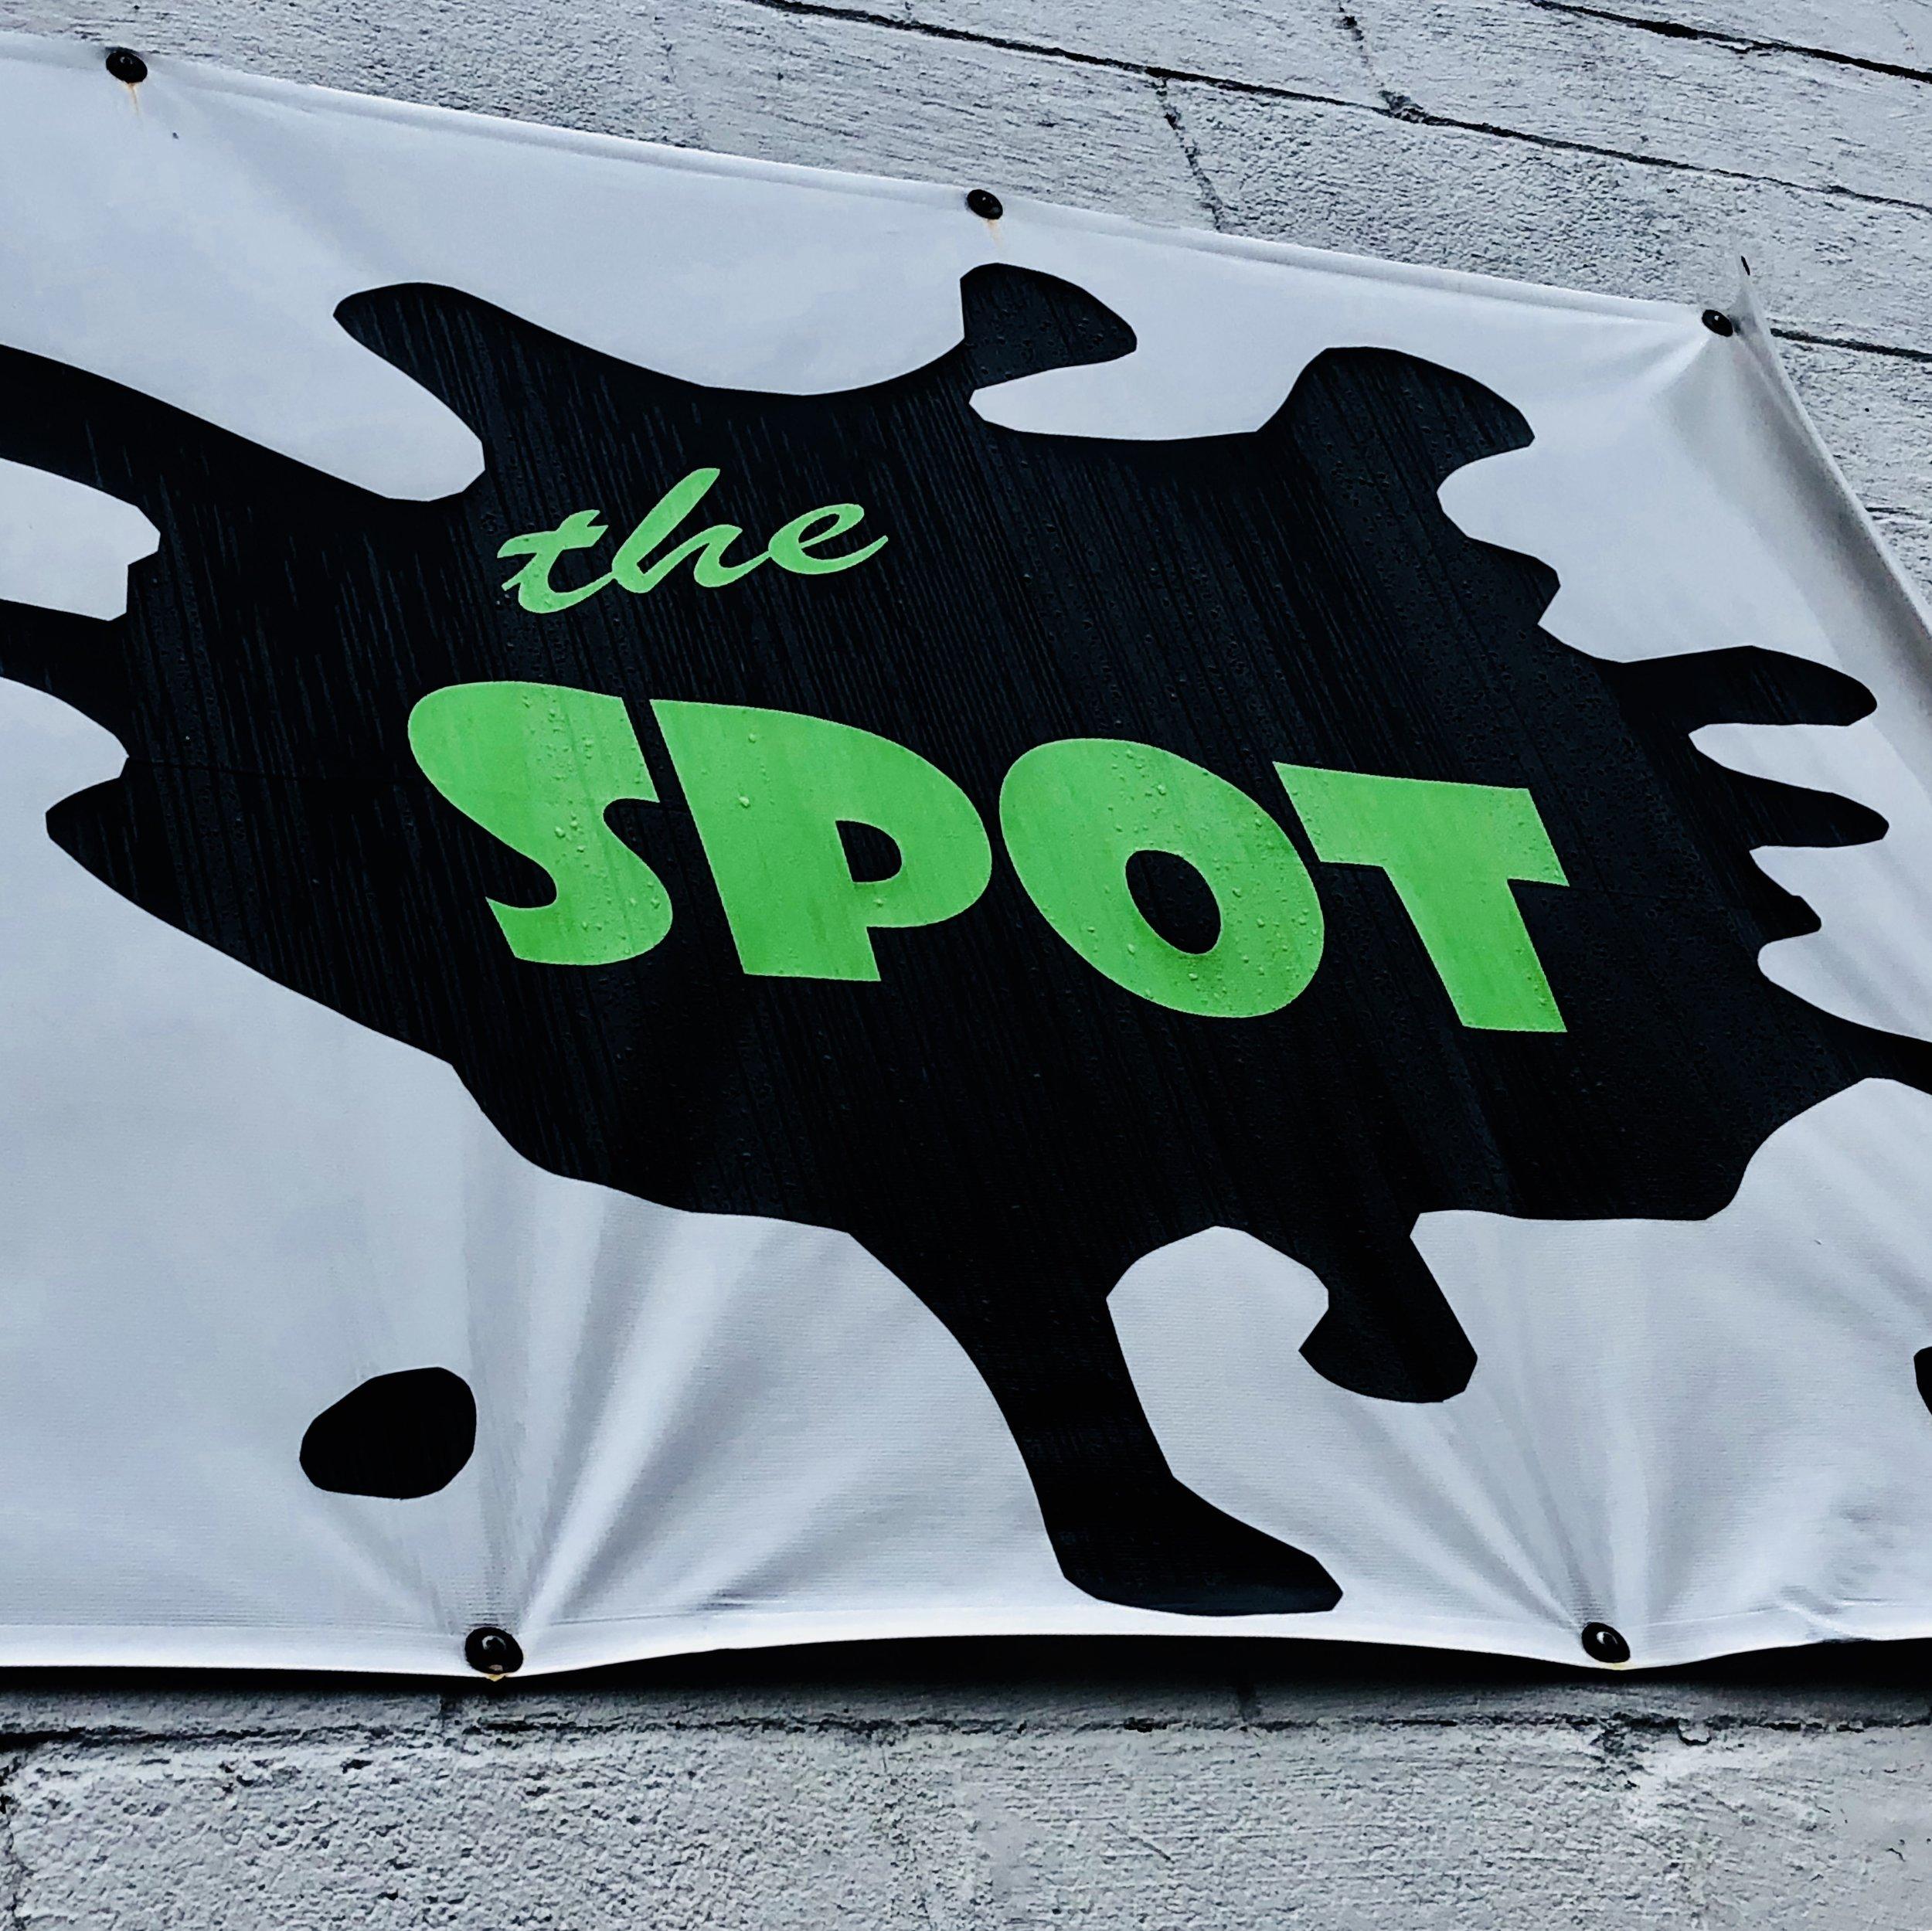 Spot1.jpg